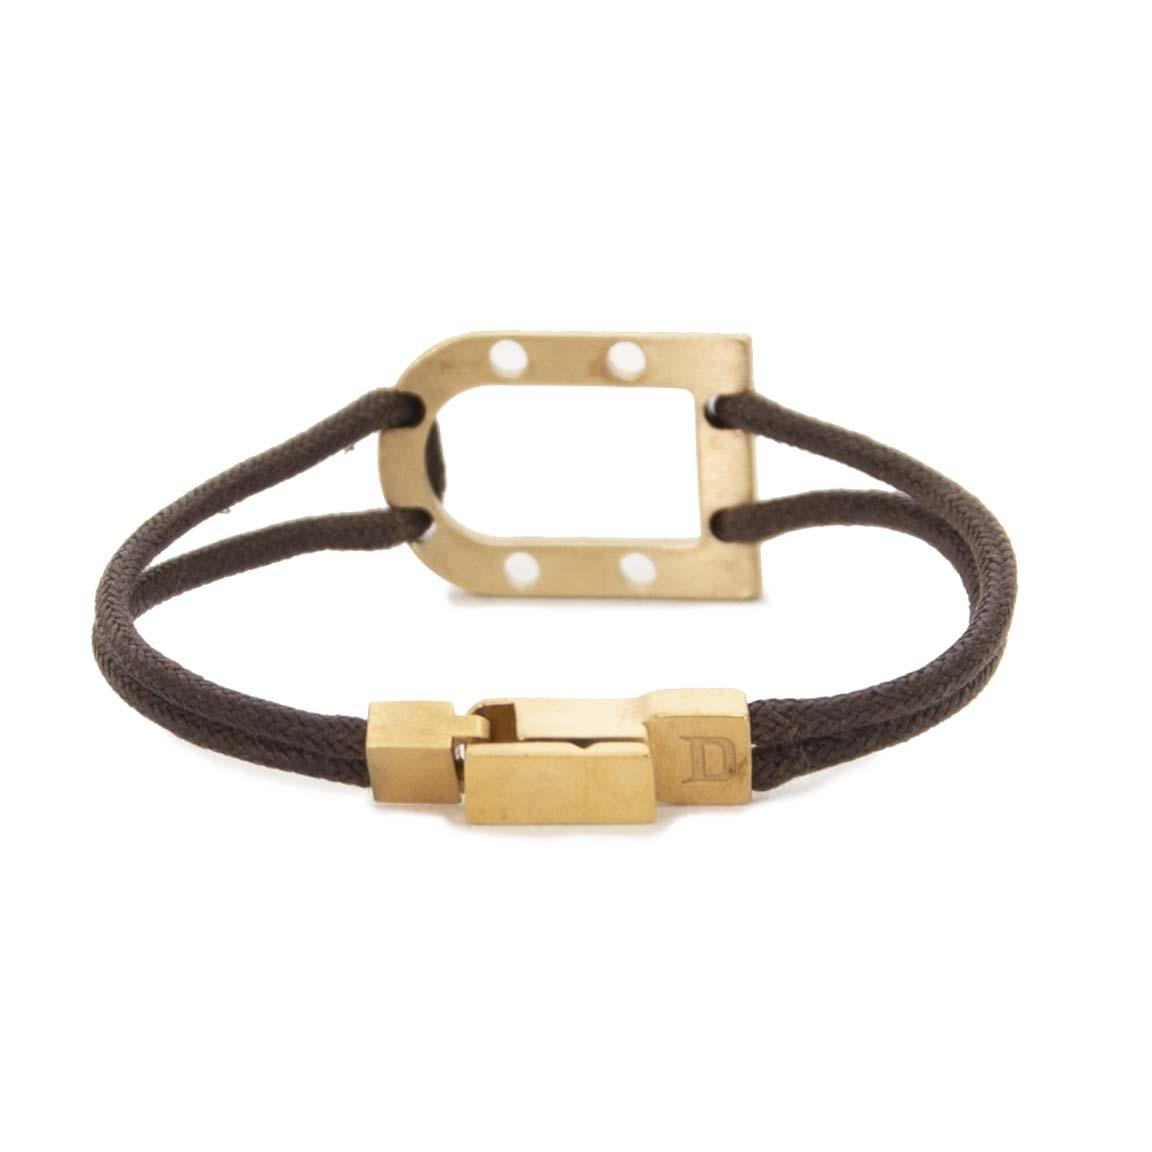 shop safe online Delvaux Brown And Matt Gold D Bracelet